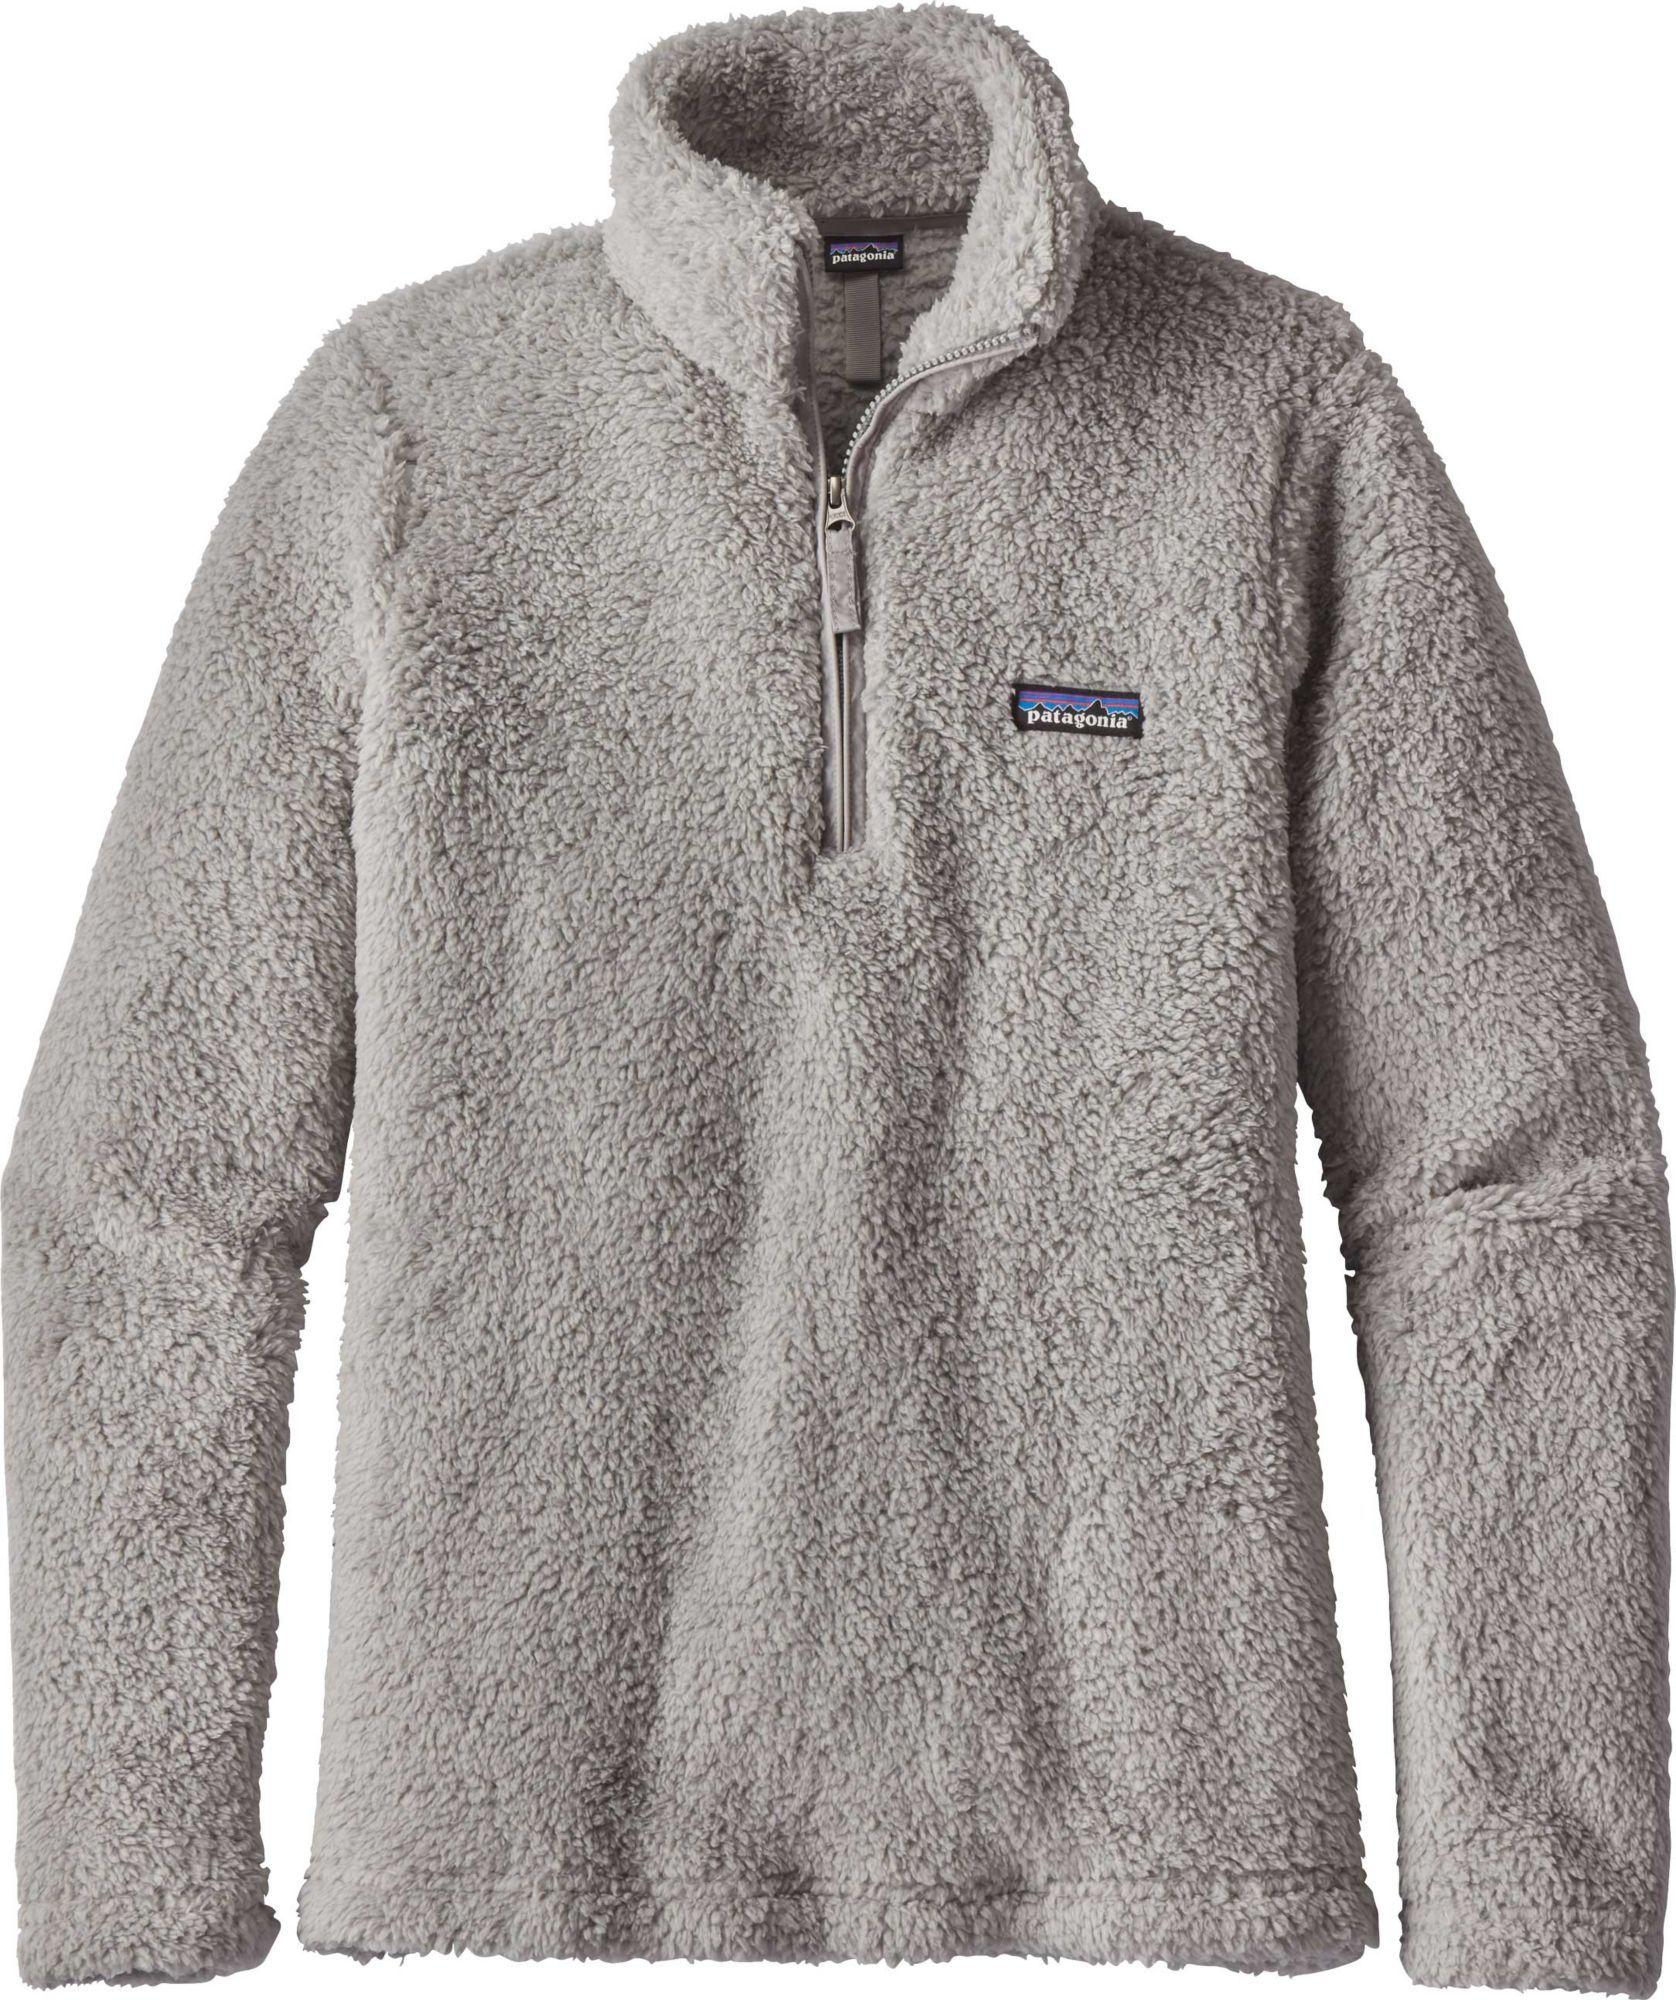 Coats & Jackets Clothing, Shoes & Accessories Patagonia Synchilla Fleece Black Full Zip Vest Men's Large More Discounts Surprises